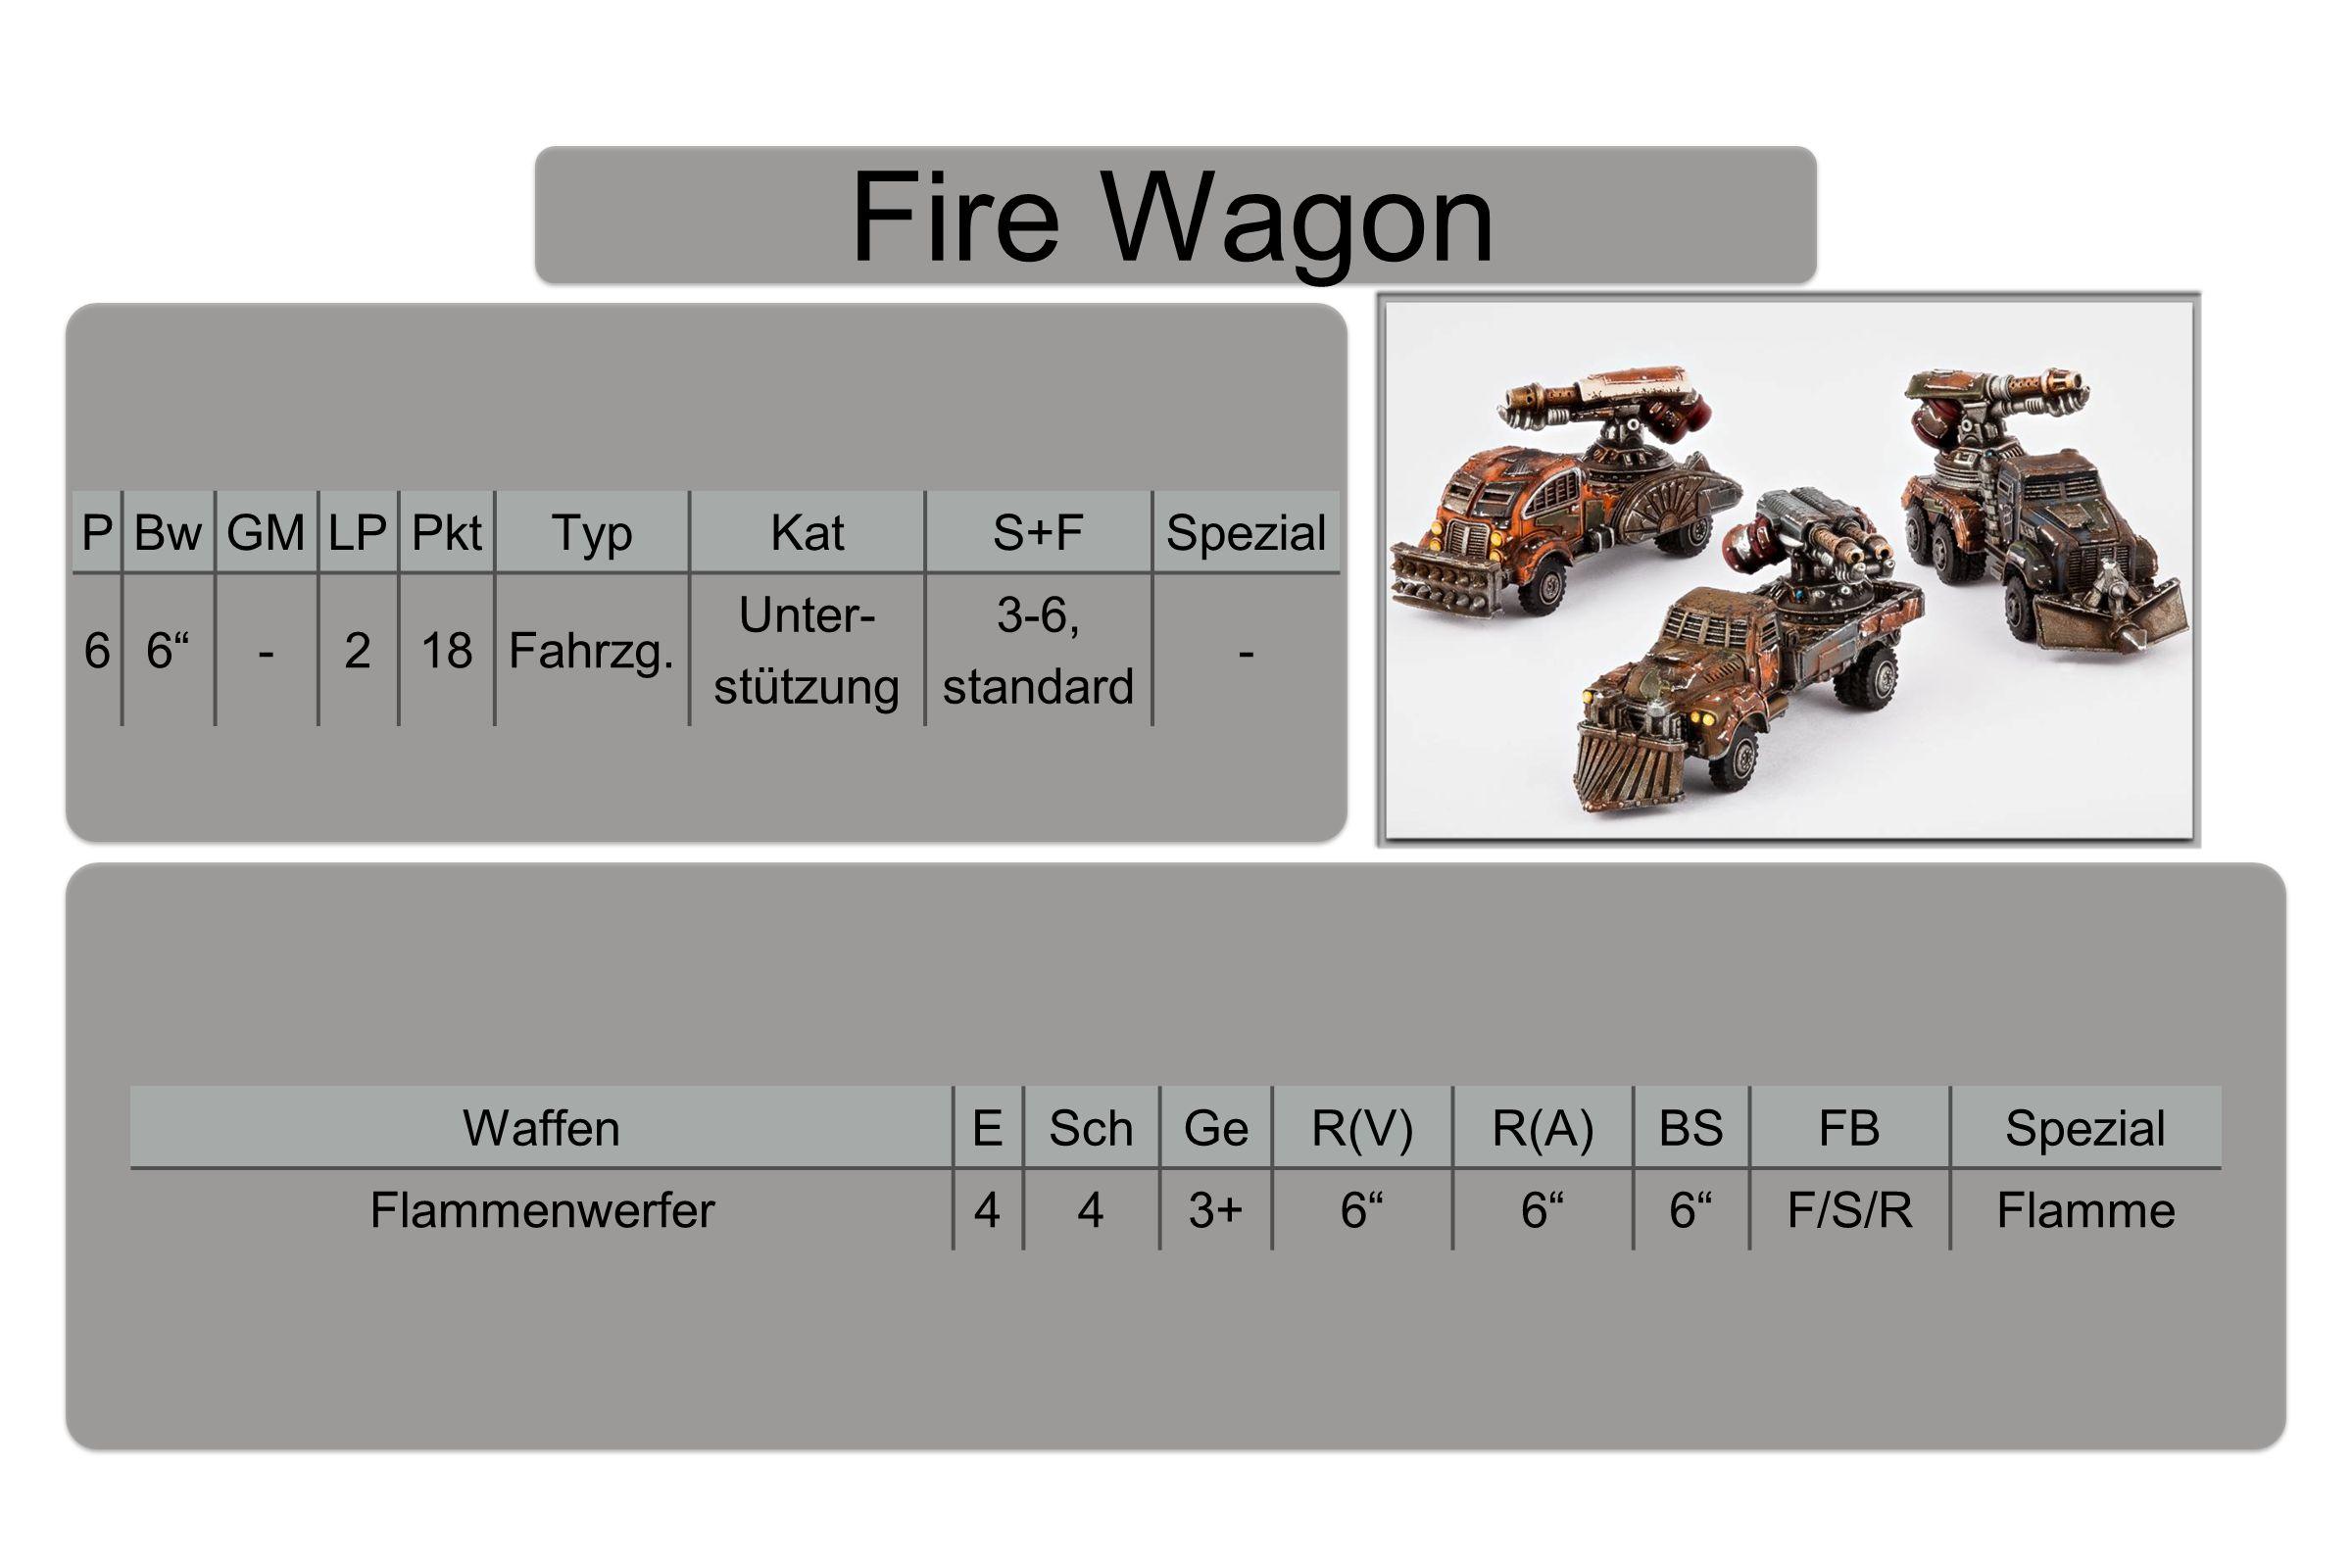 Fire Wagon PBwGMLPPktTypKatS+FSpezial 66 -218Fahrzg.